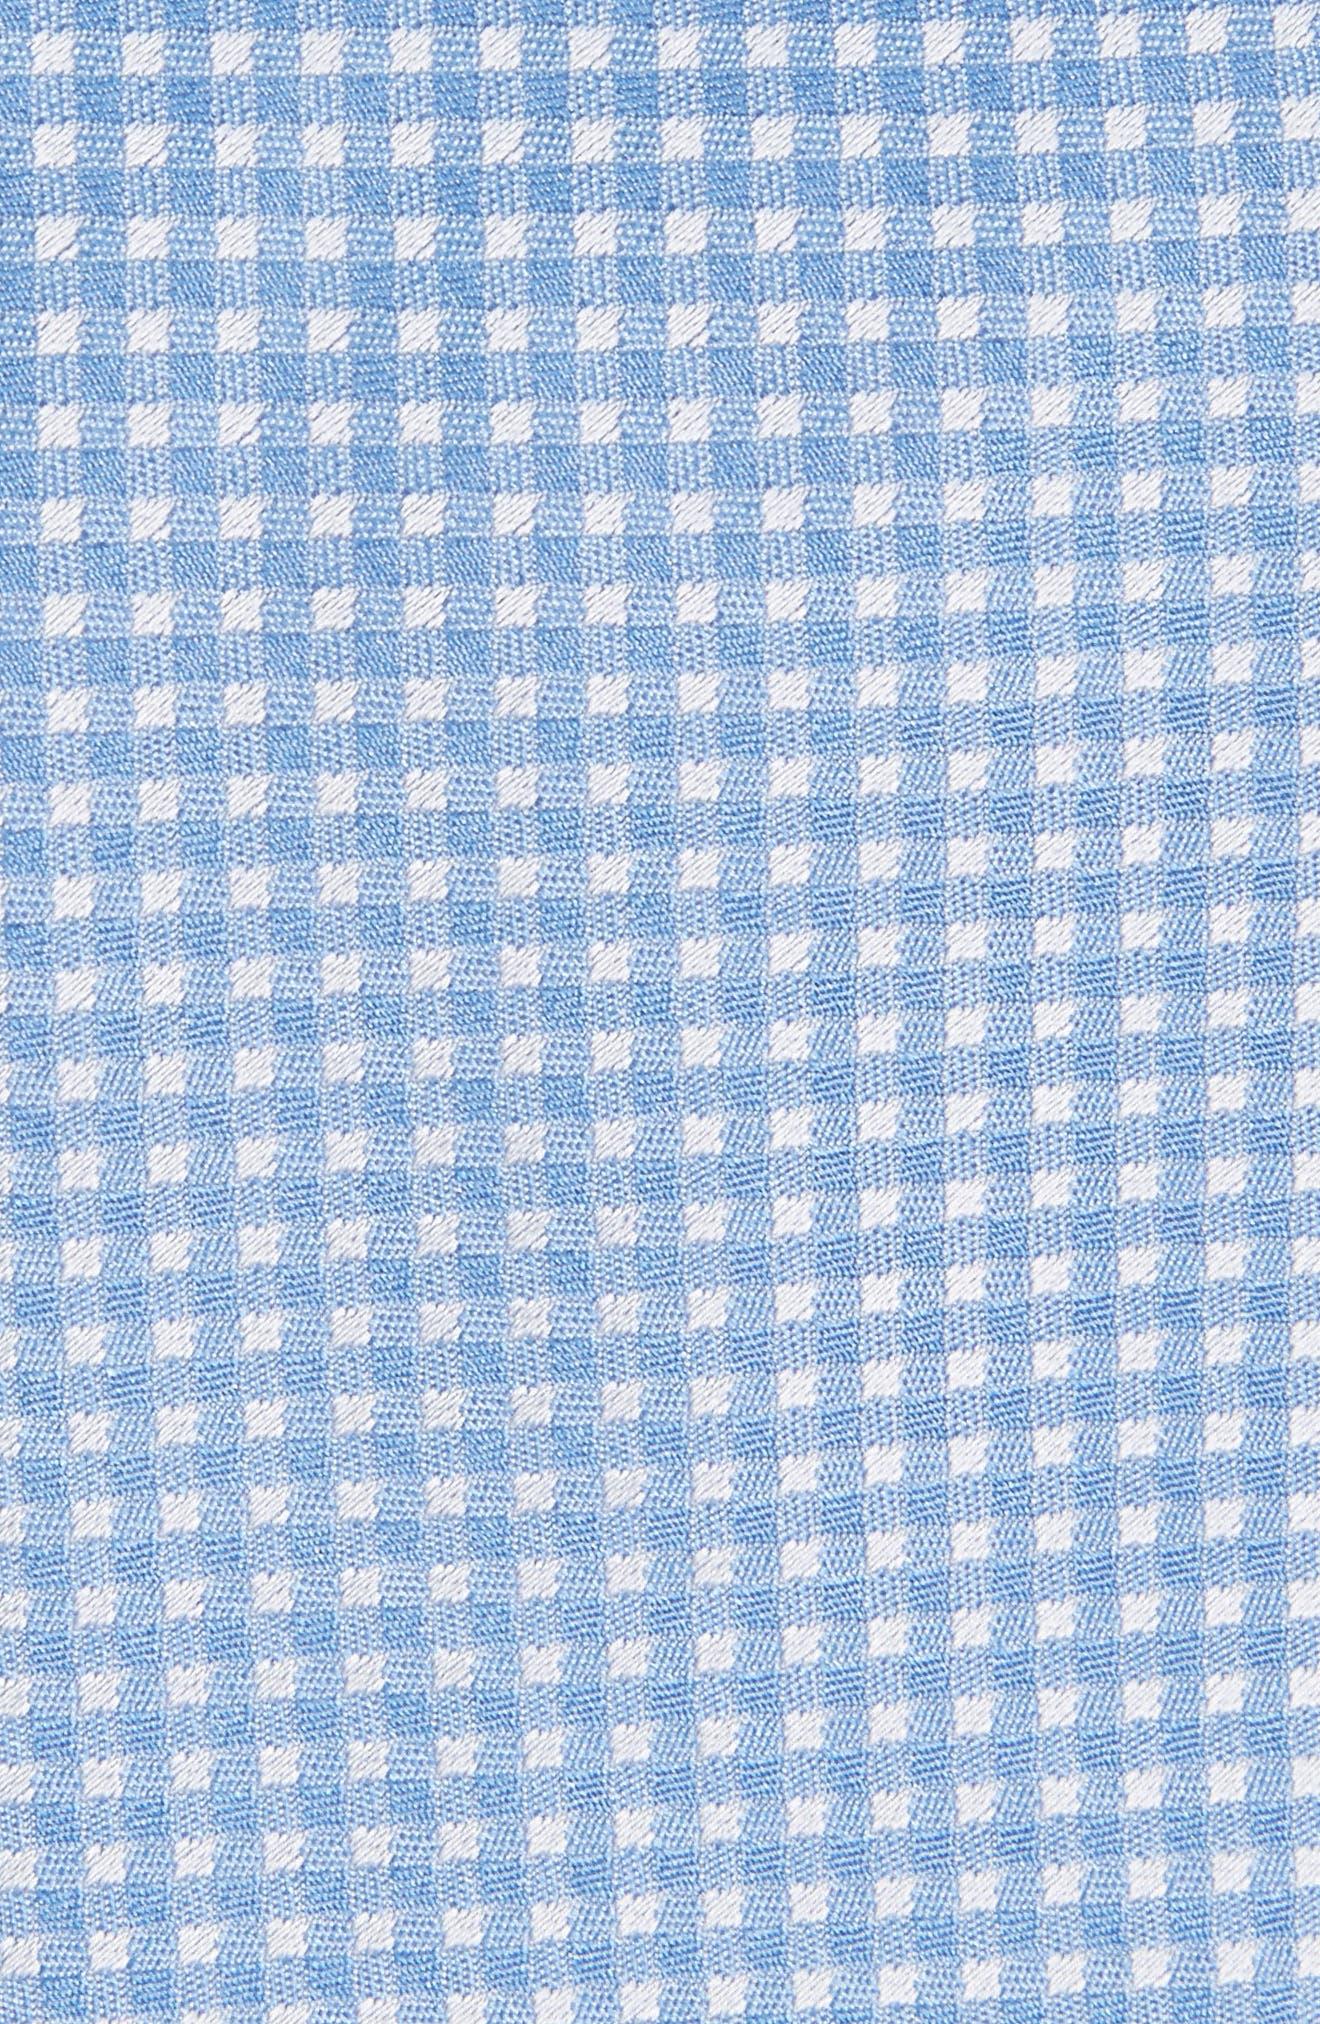 Bedrock Floral Silk Tie,                             Alternate thumbnail 2, color,                             700